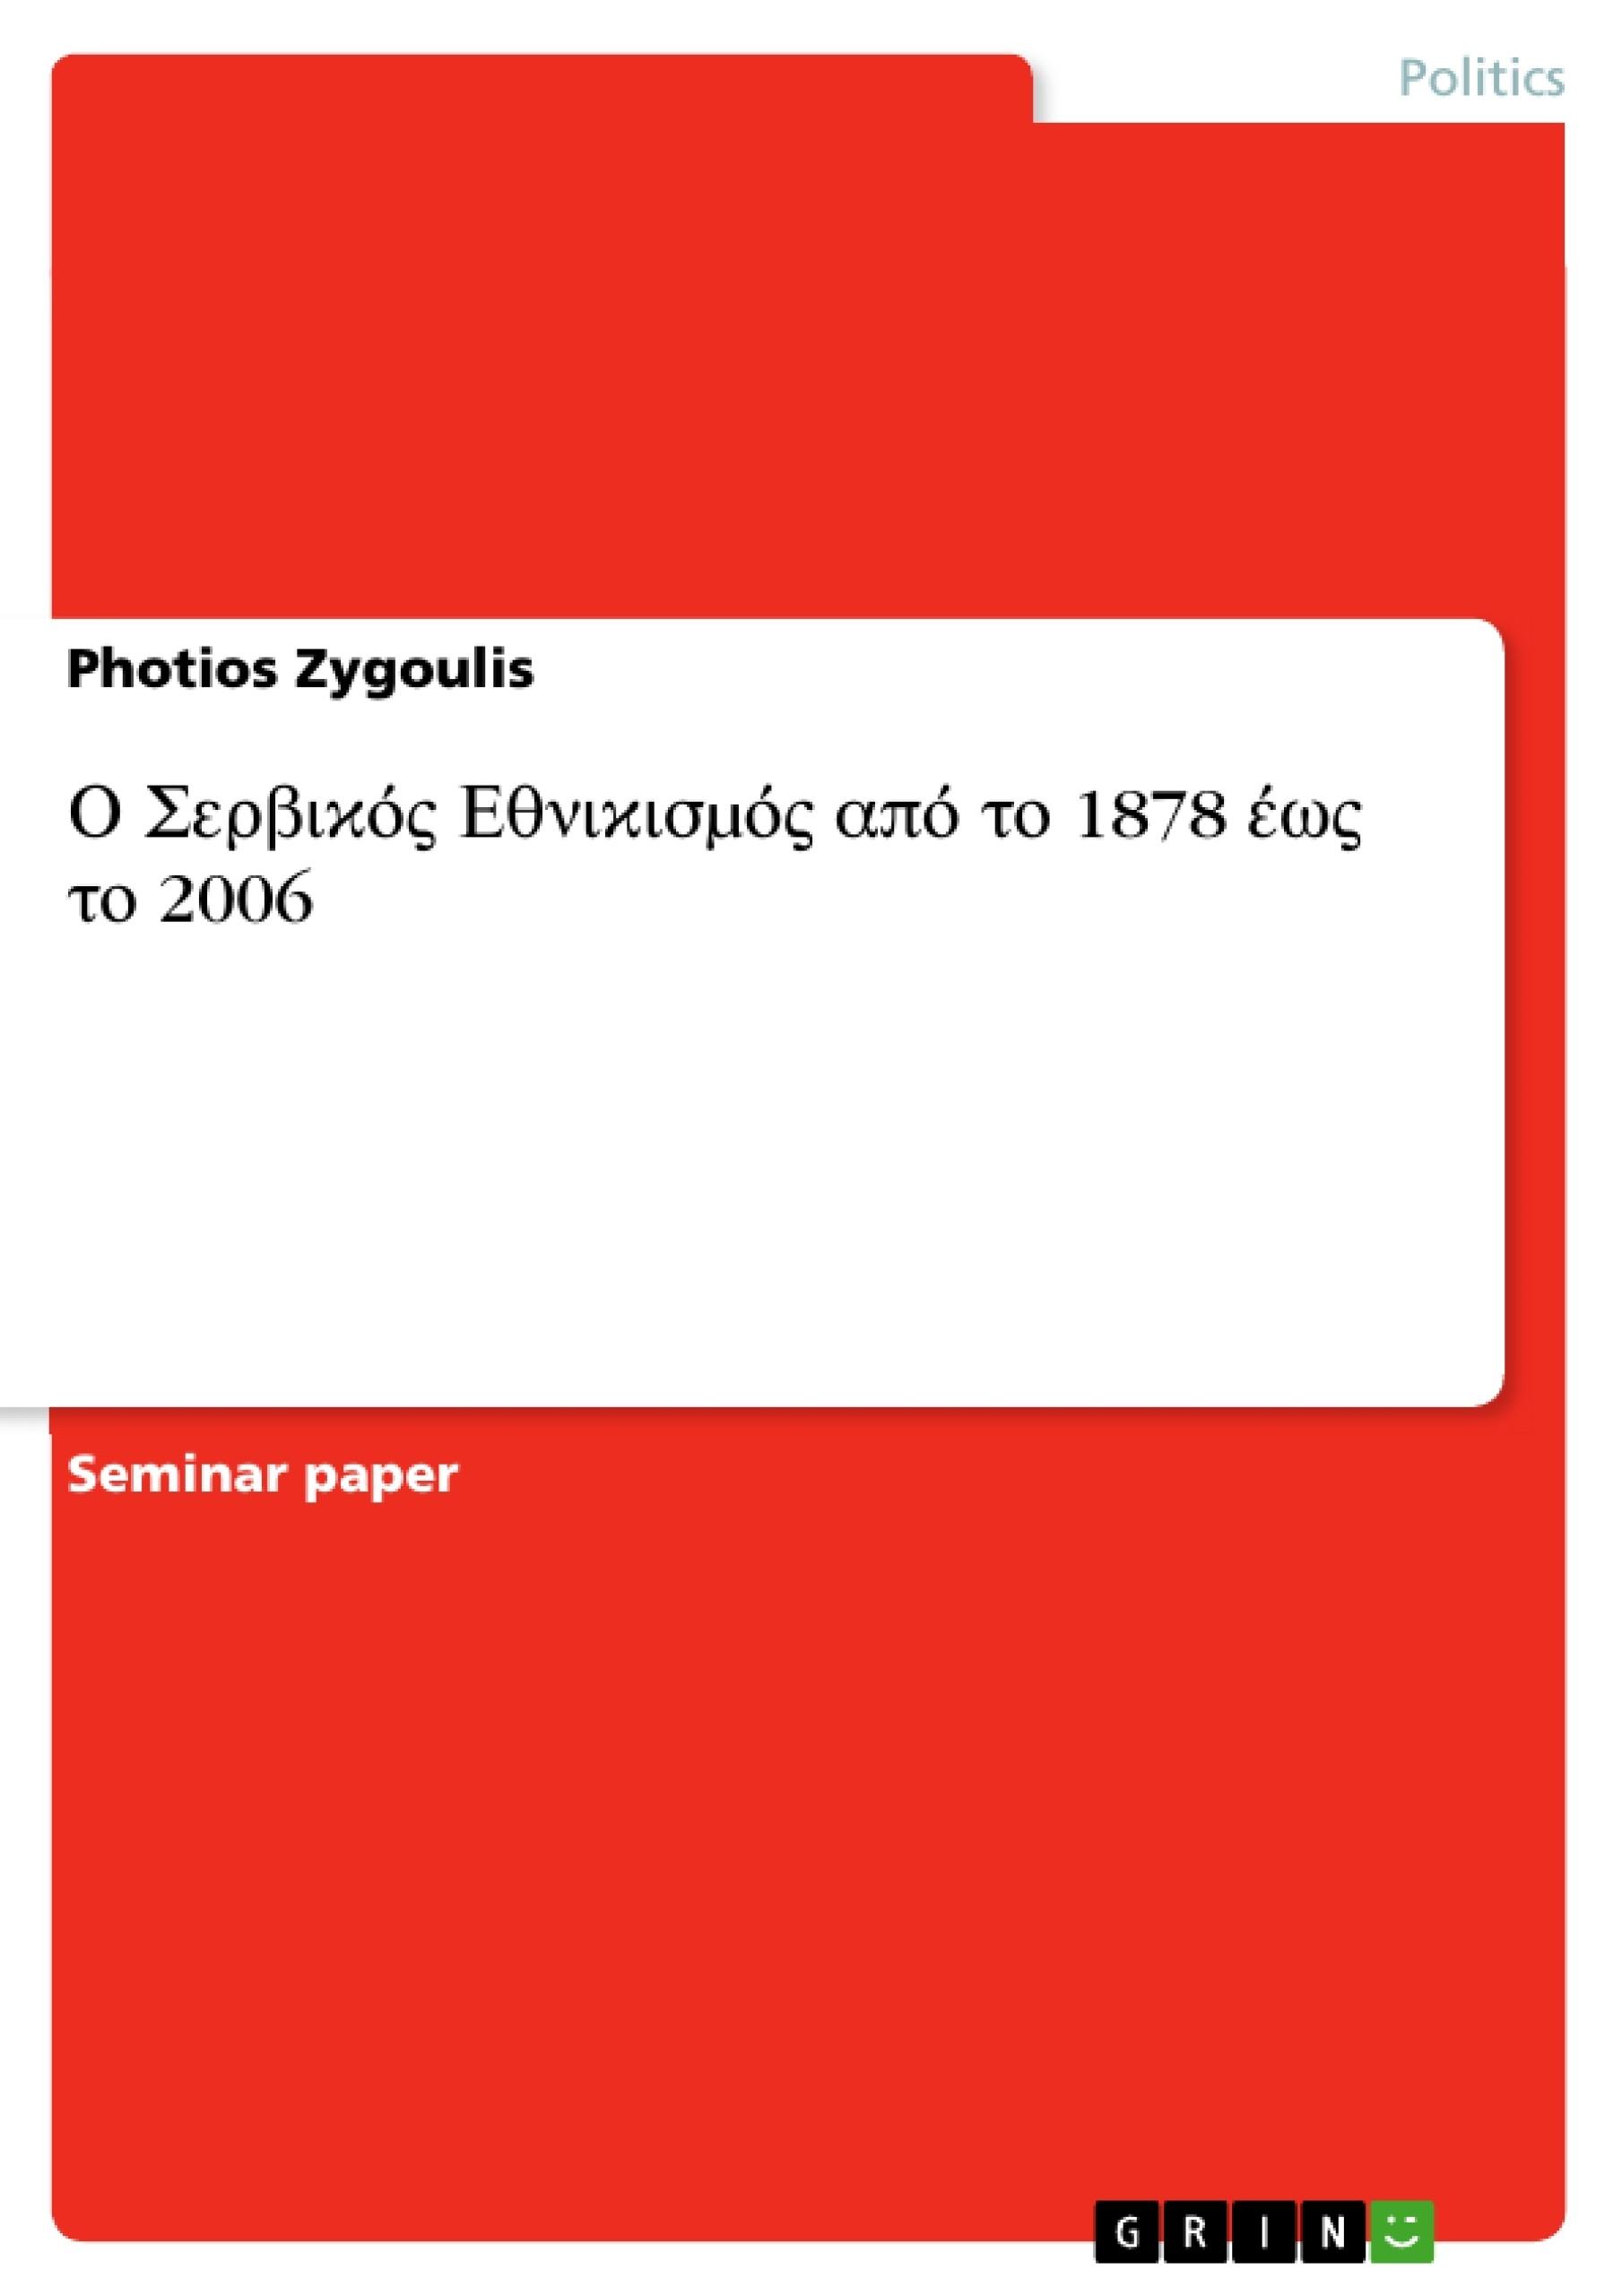 Title: Ο Σερβικός Εθνικισμός από το 1878 έως το 2006